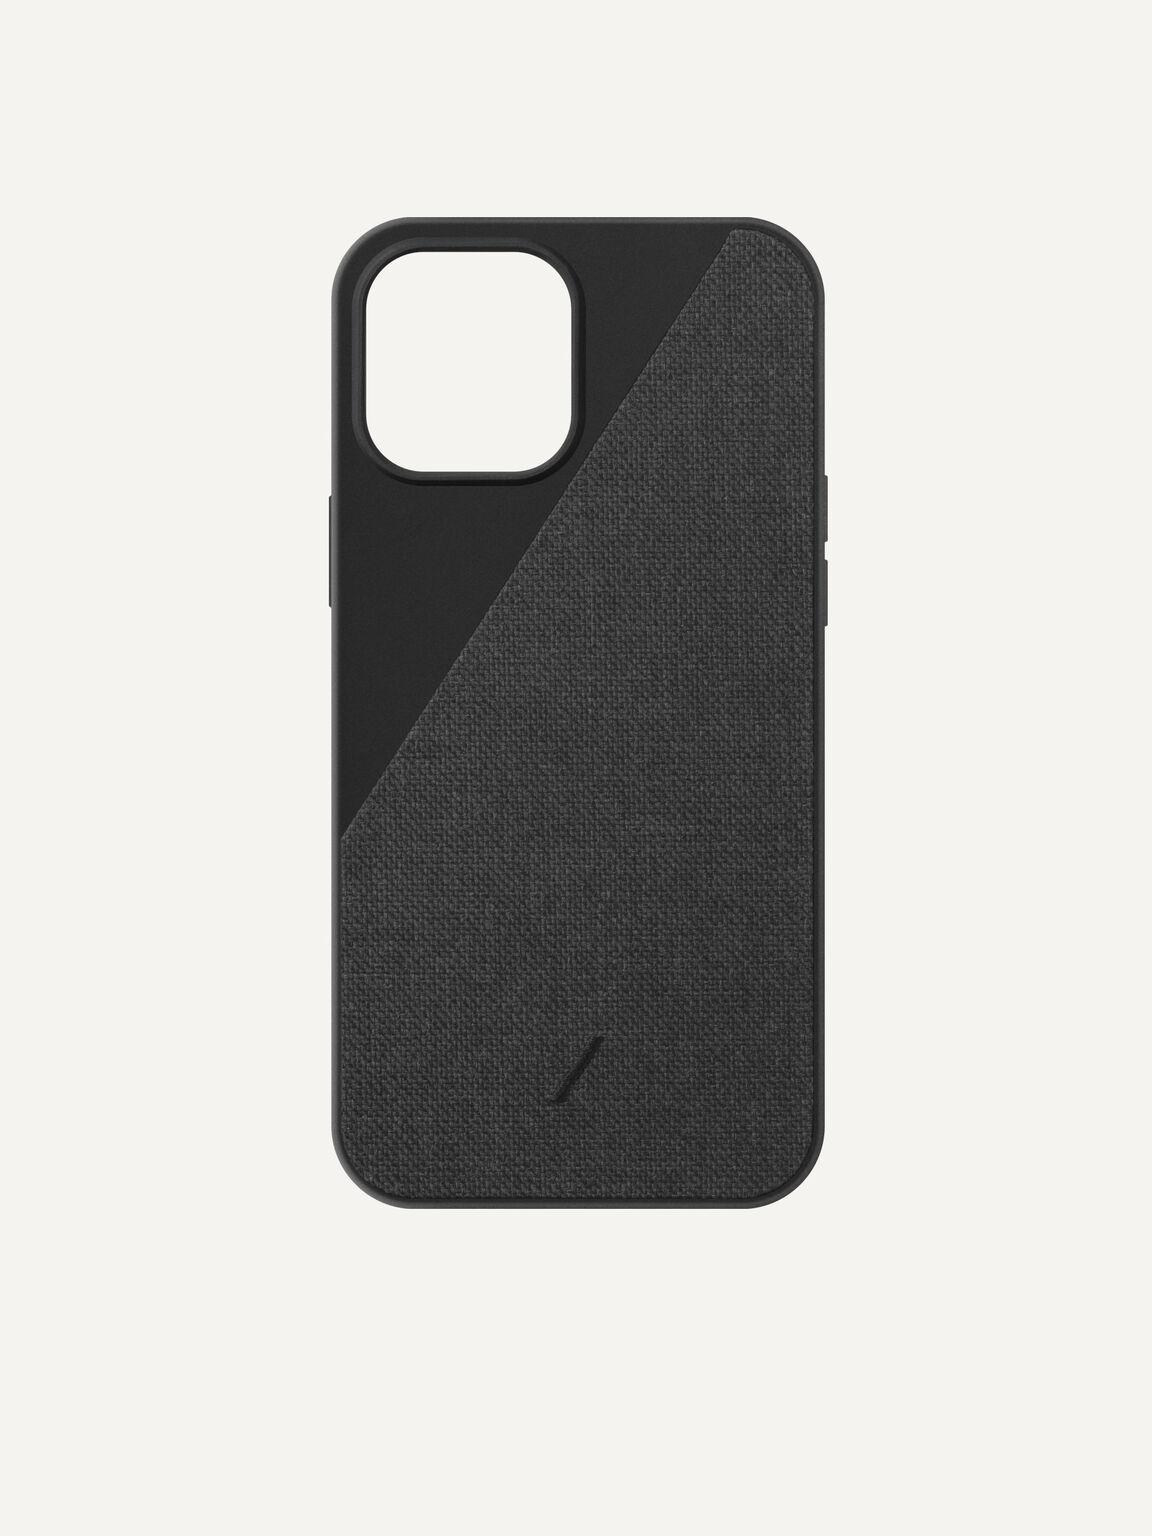 Canvas Fabric iPhone 12 Max Pro Case, Black, hi-res